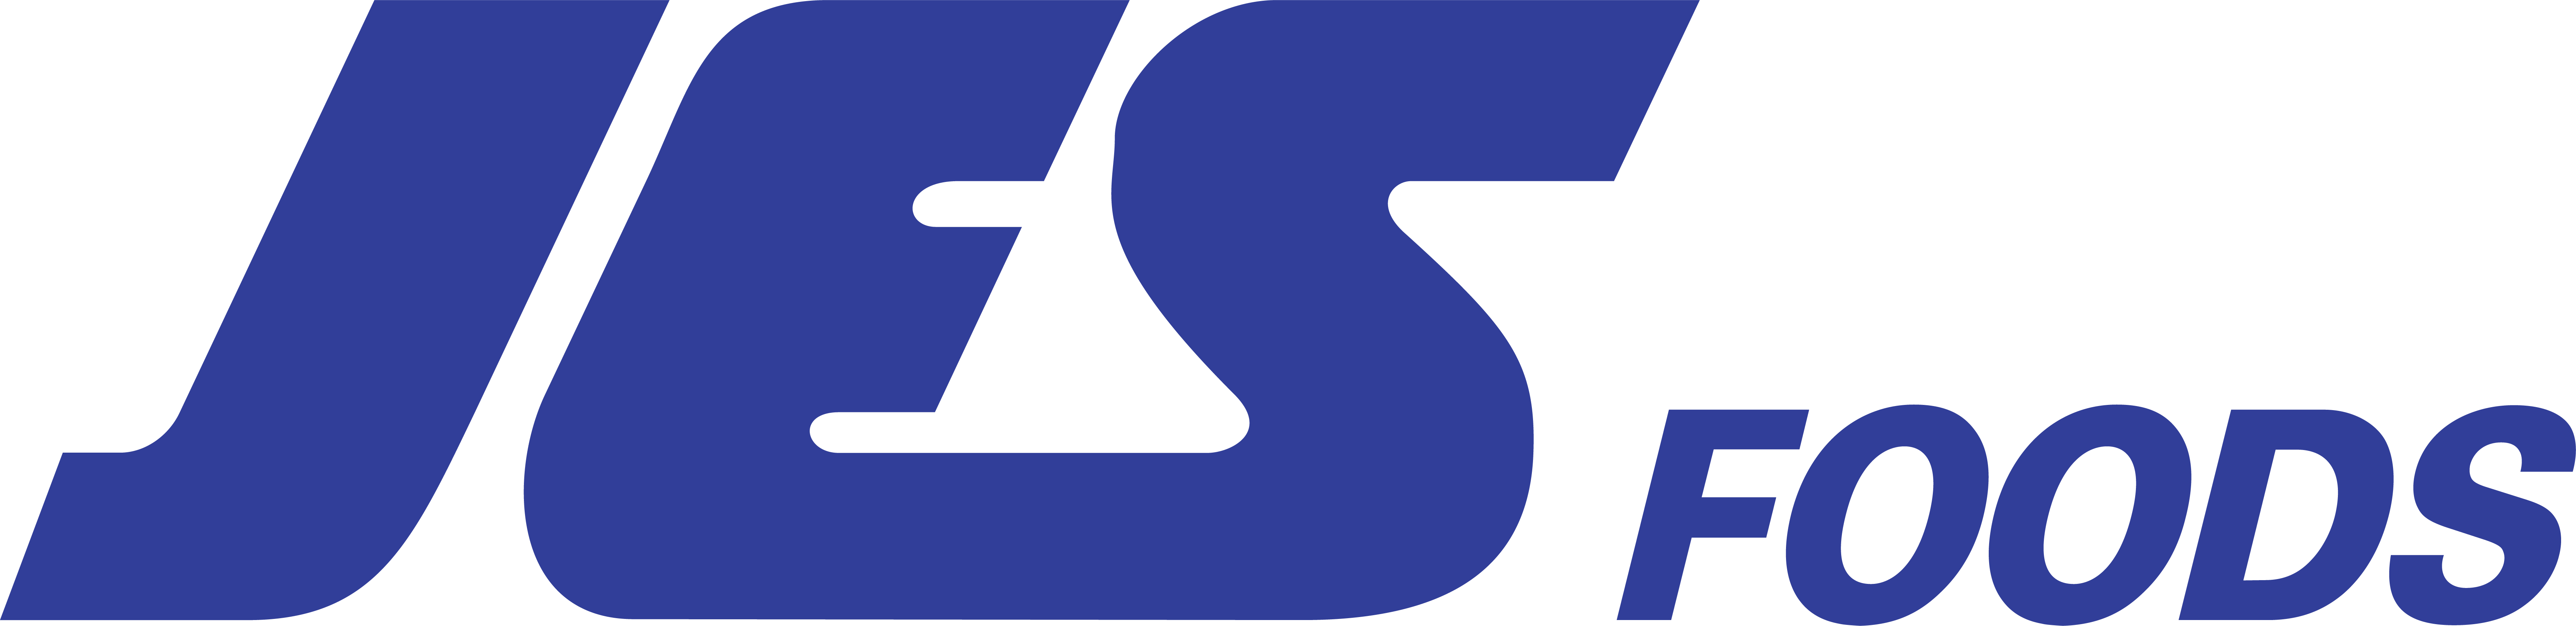 JES Foods Inc.